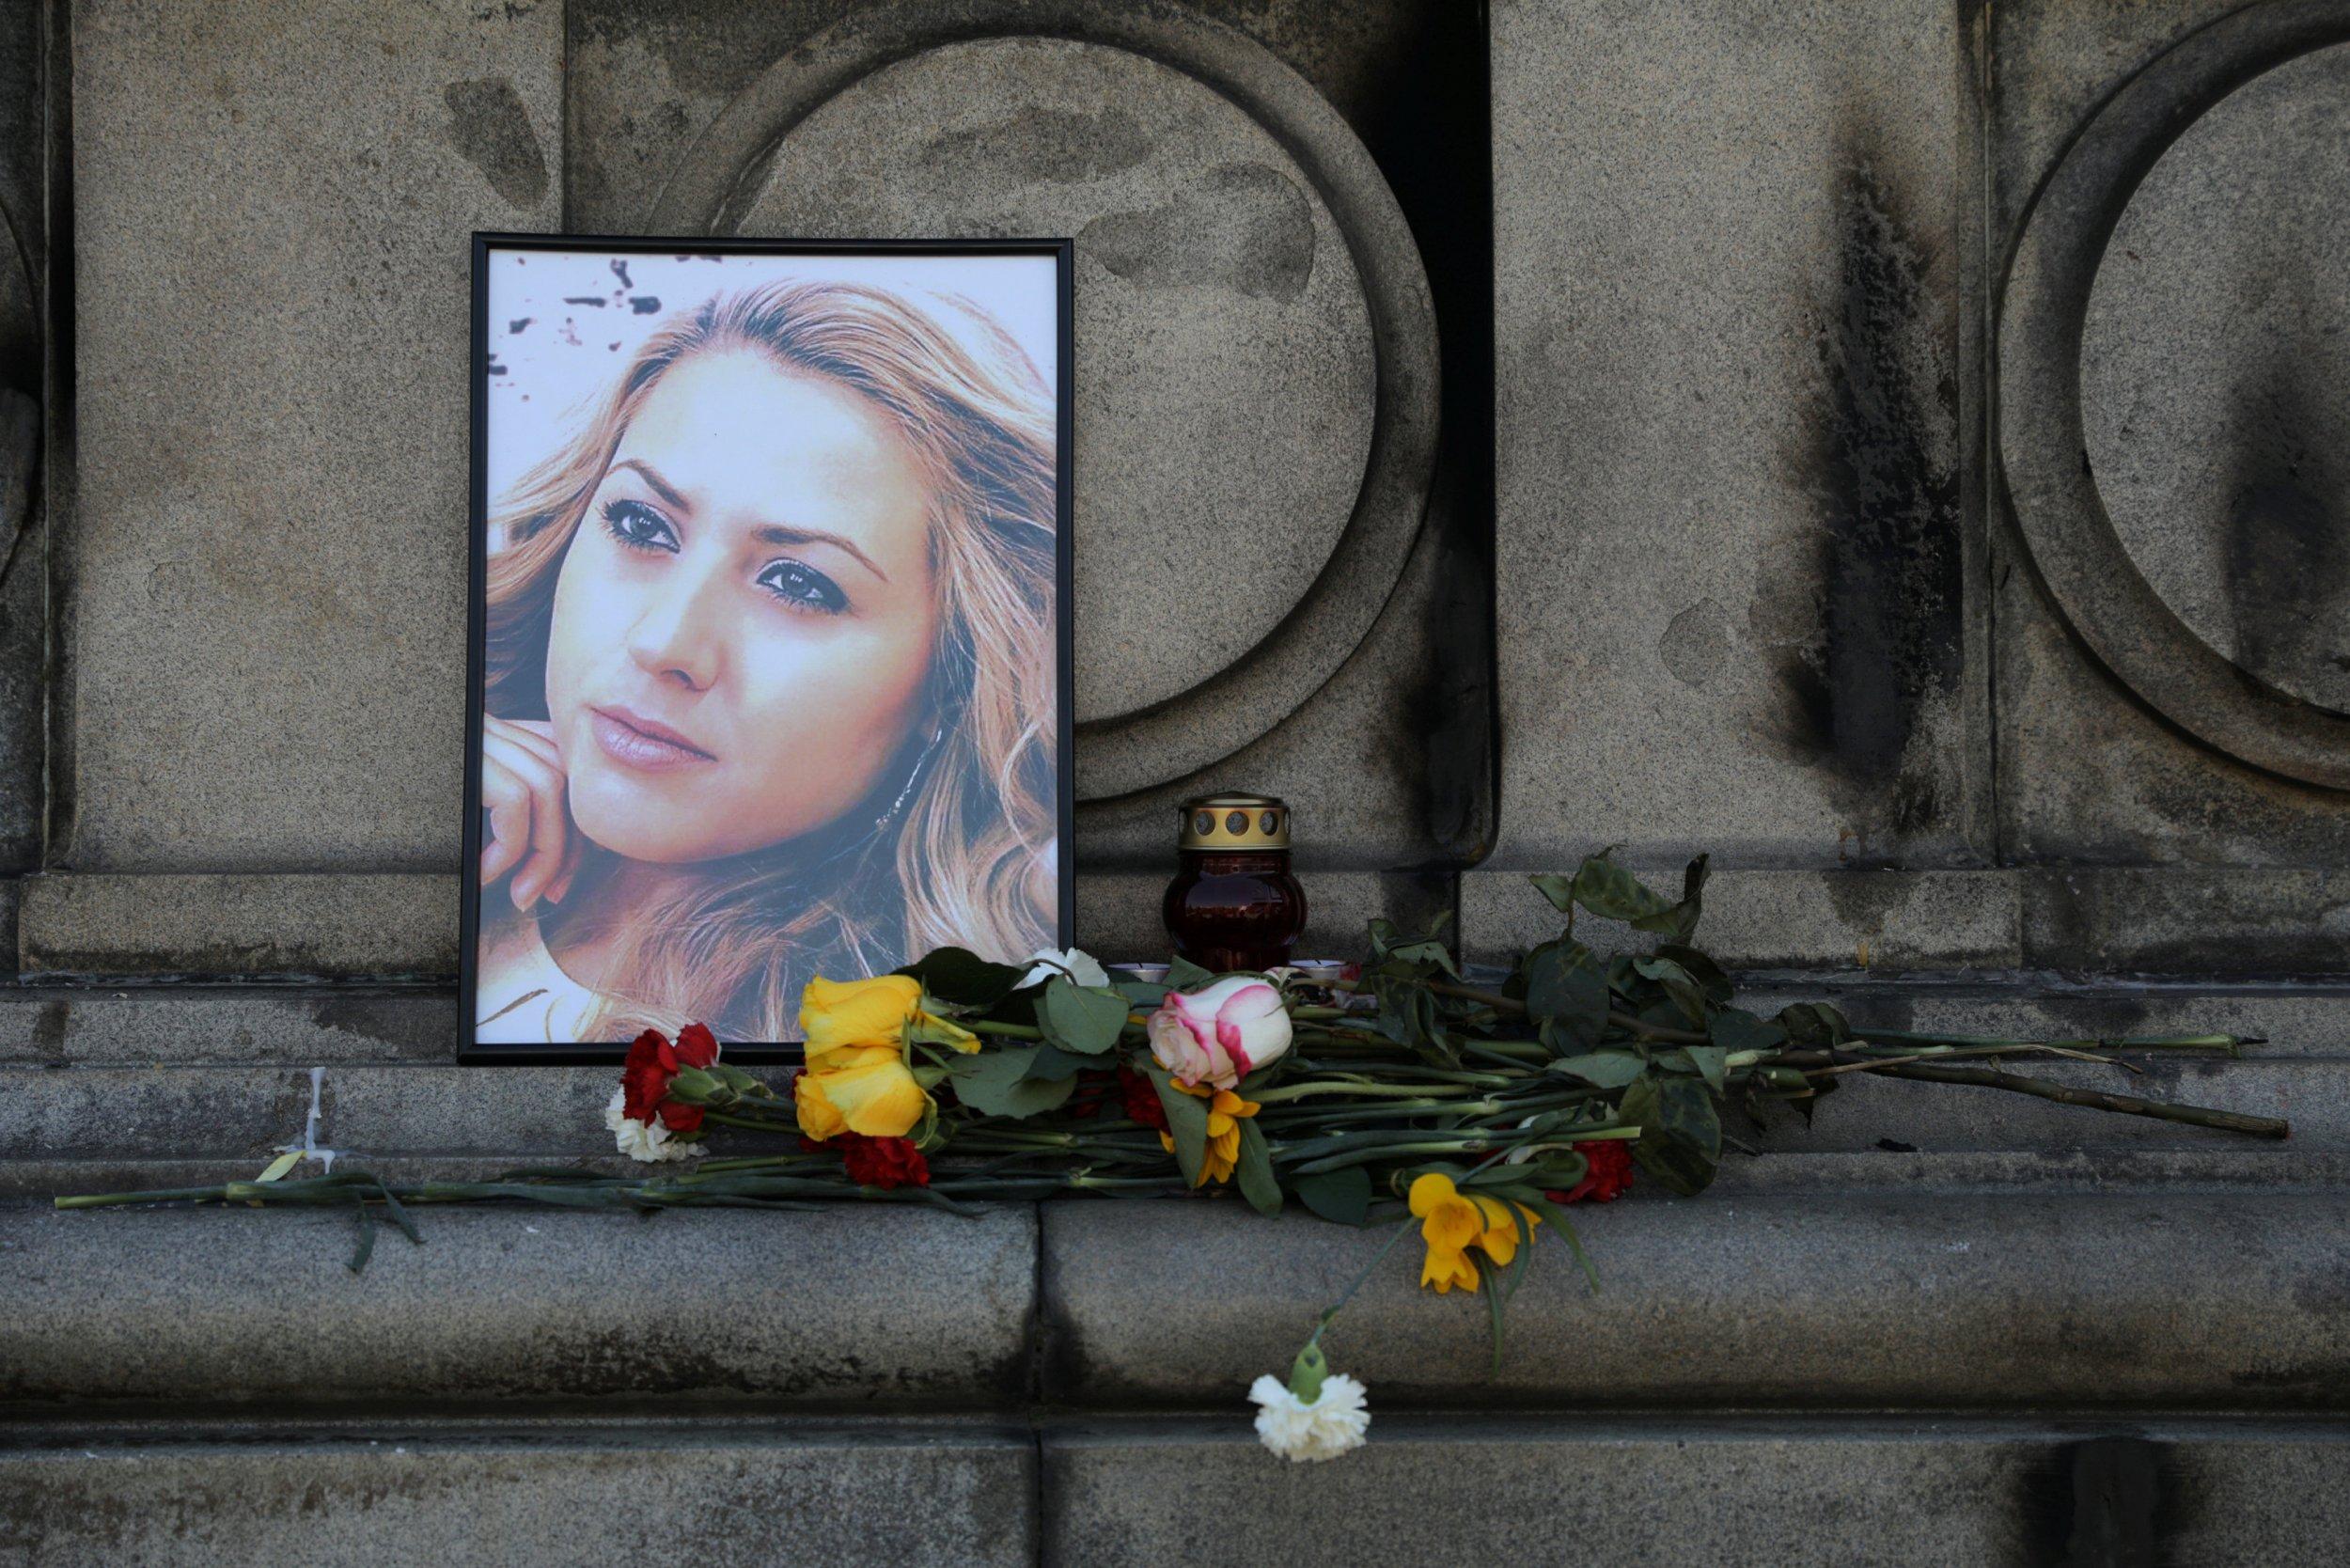 2018-10-10T070648Z_2_LYNXNPEE990FF_RTROPTP_4_BULGARIA-MURDER